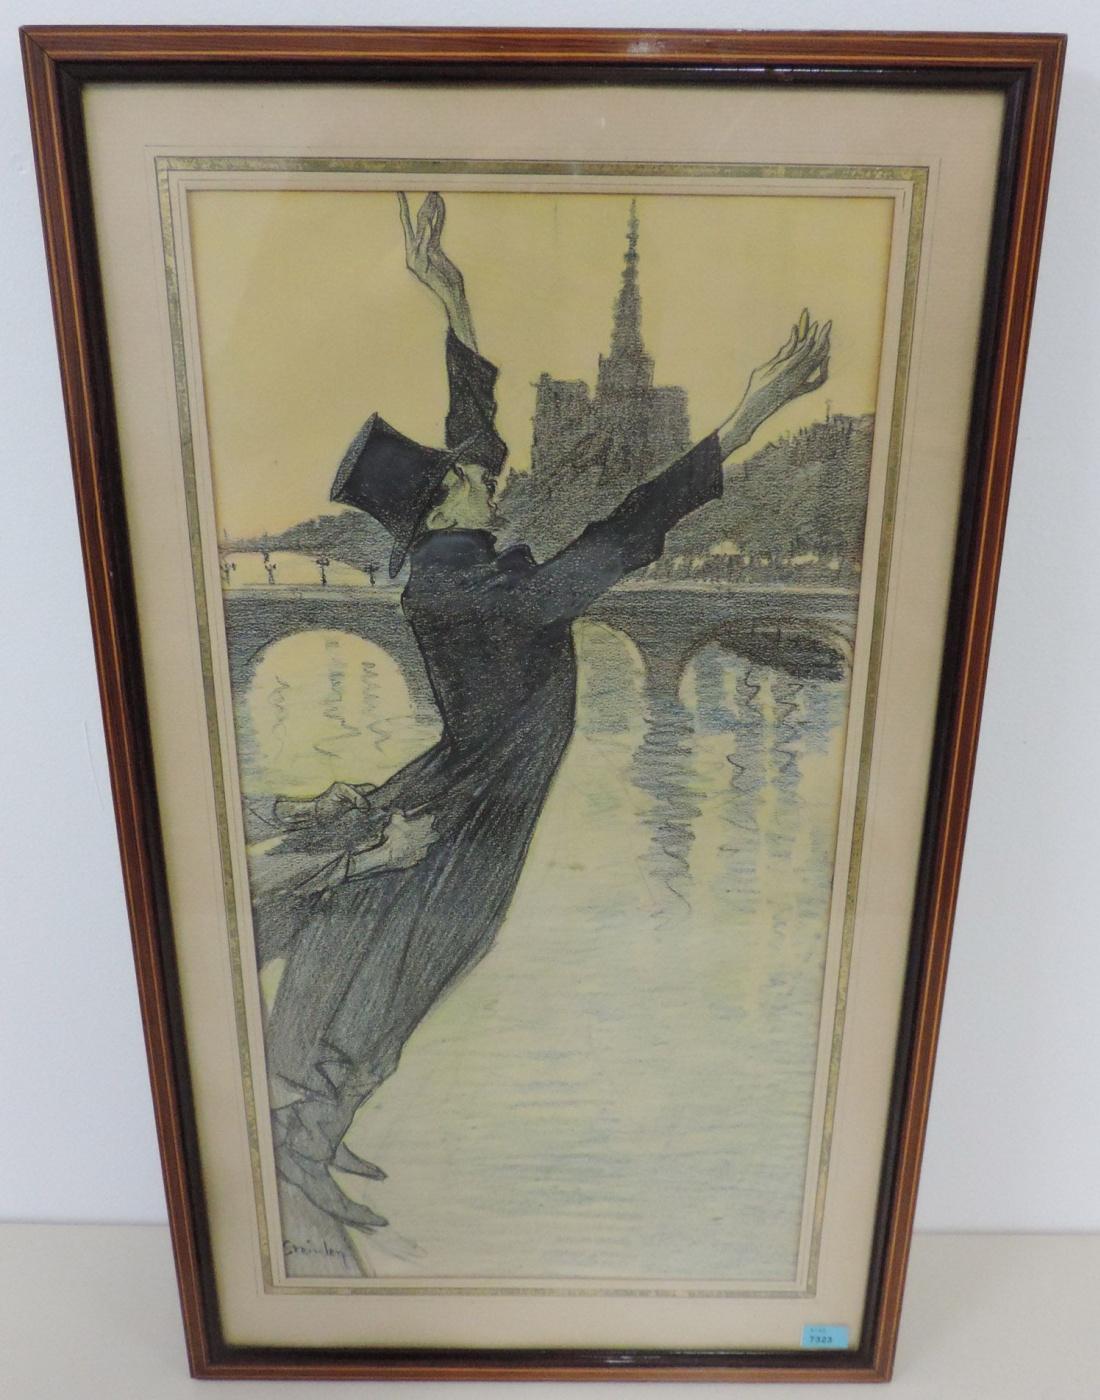 Suicide over the Seine